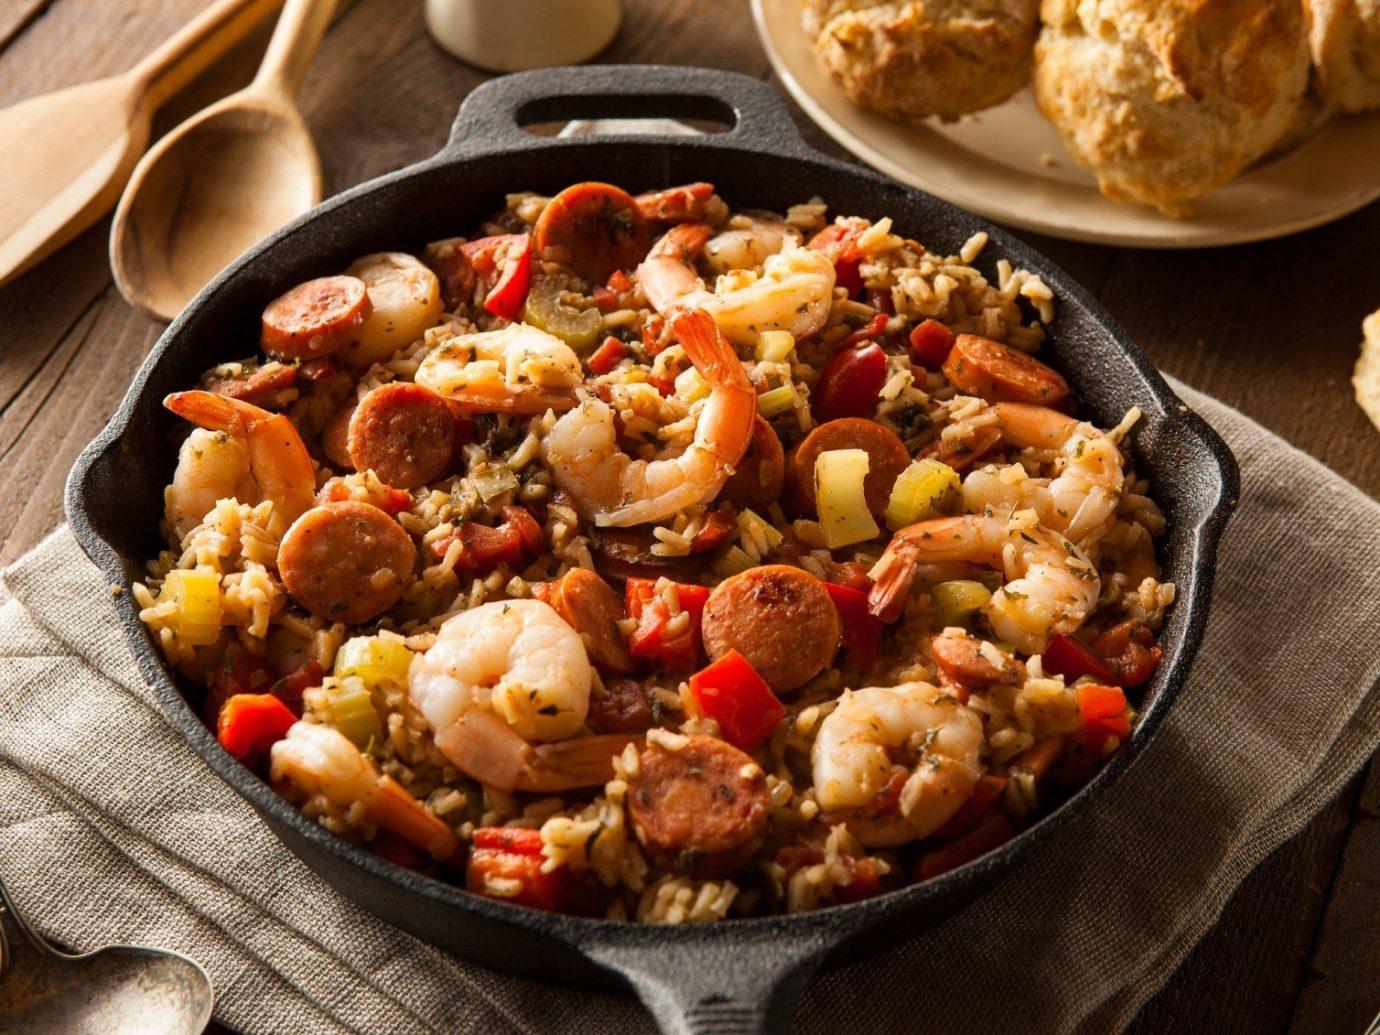 Offbeat Trip Ideas food dish cuisine produce meat vegetable jambalaya european food meal several